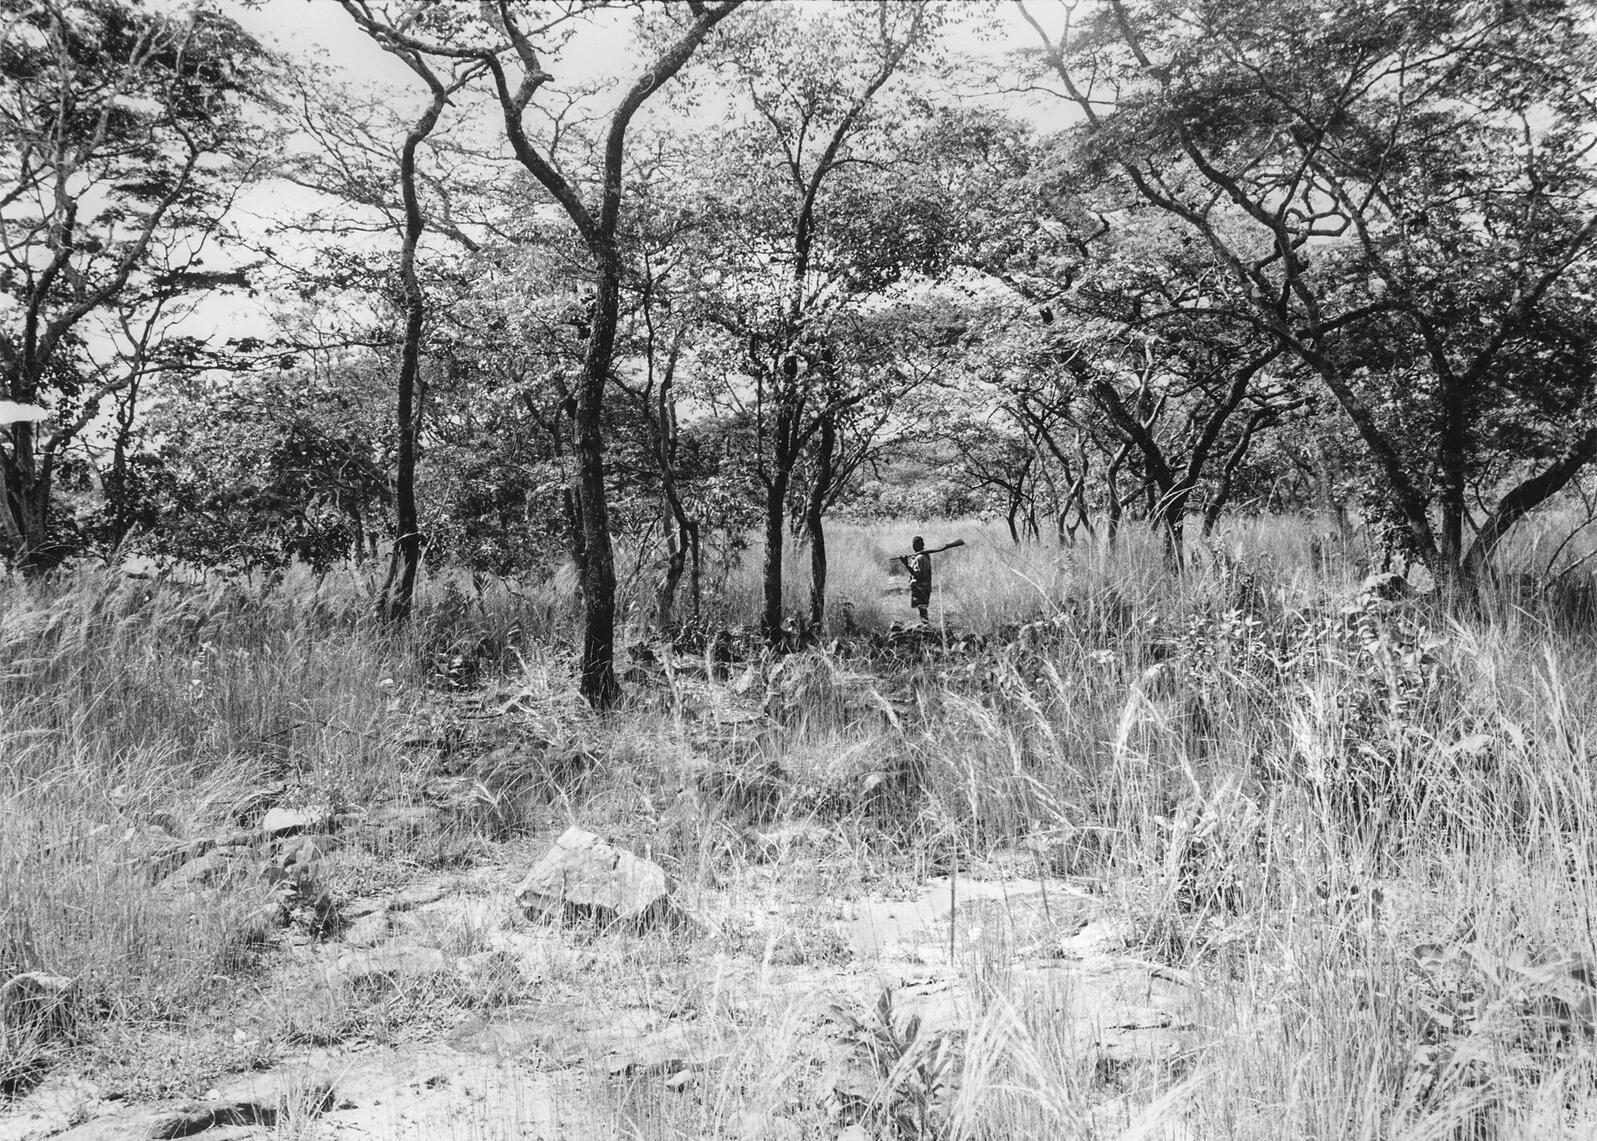 Makawa hunting in the Miombo woodlands, Zambia, 1972. Robert Payne